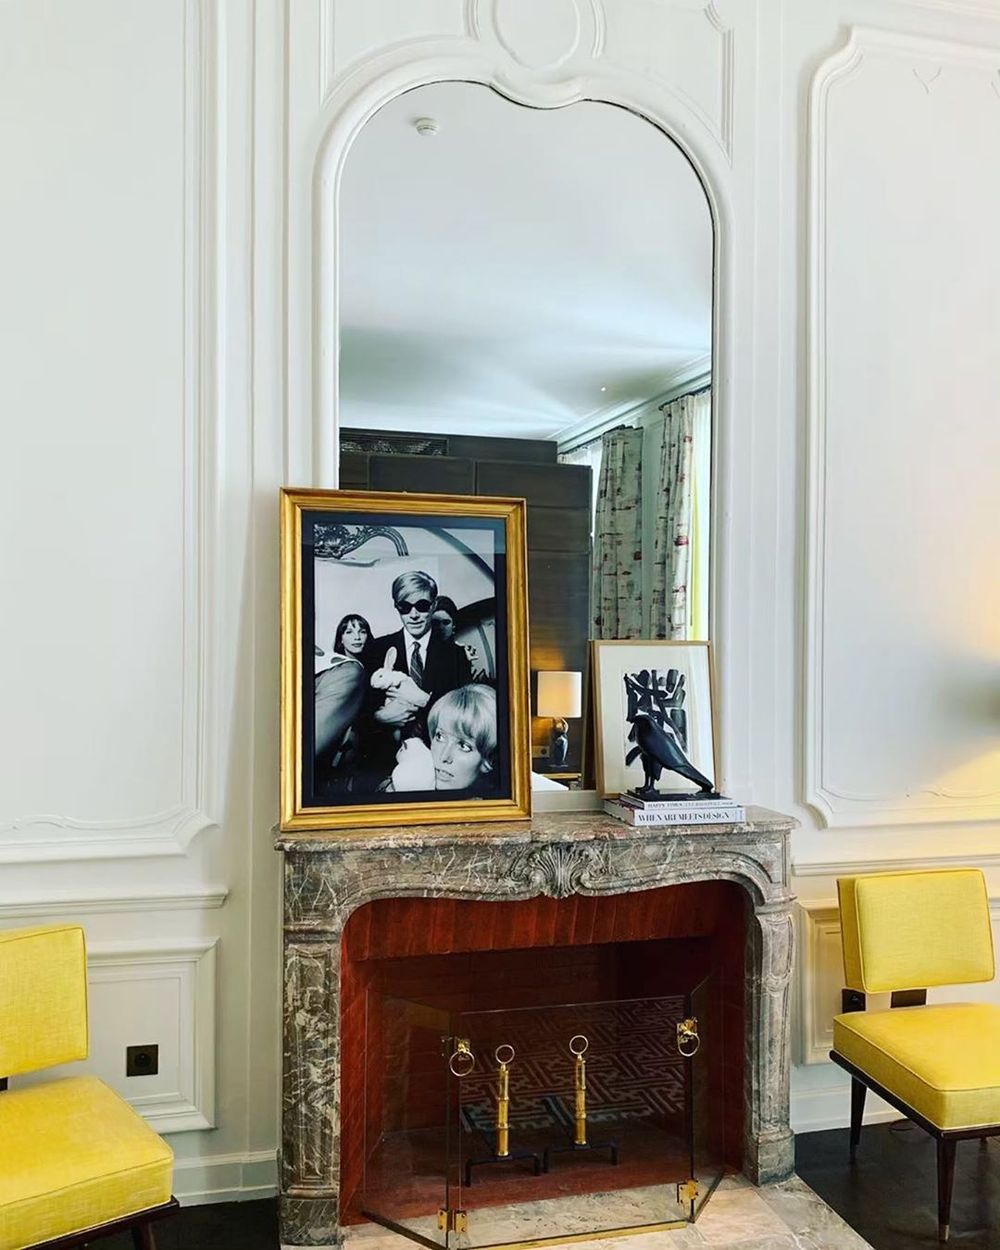 Parisian fireplace with Andy Warhol photography via @jkplaceparis